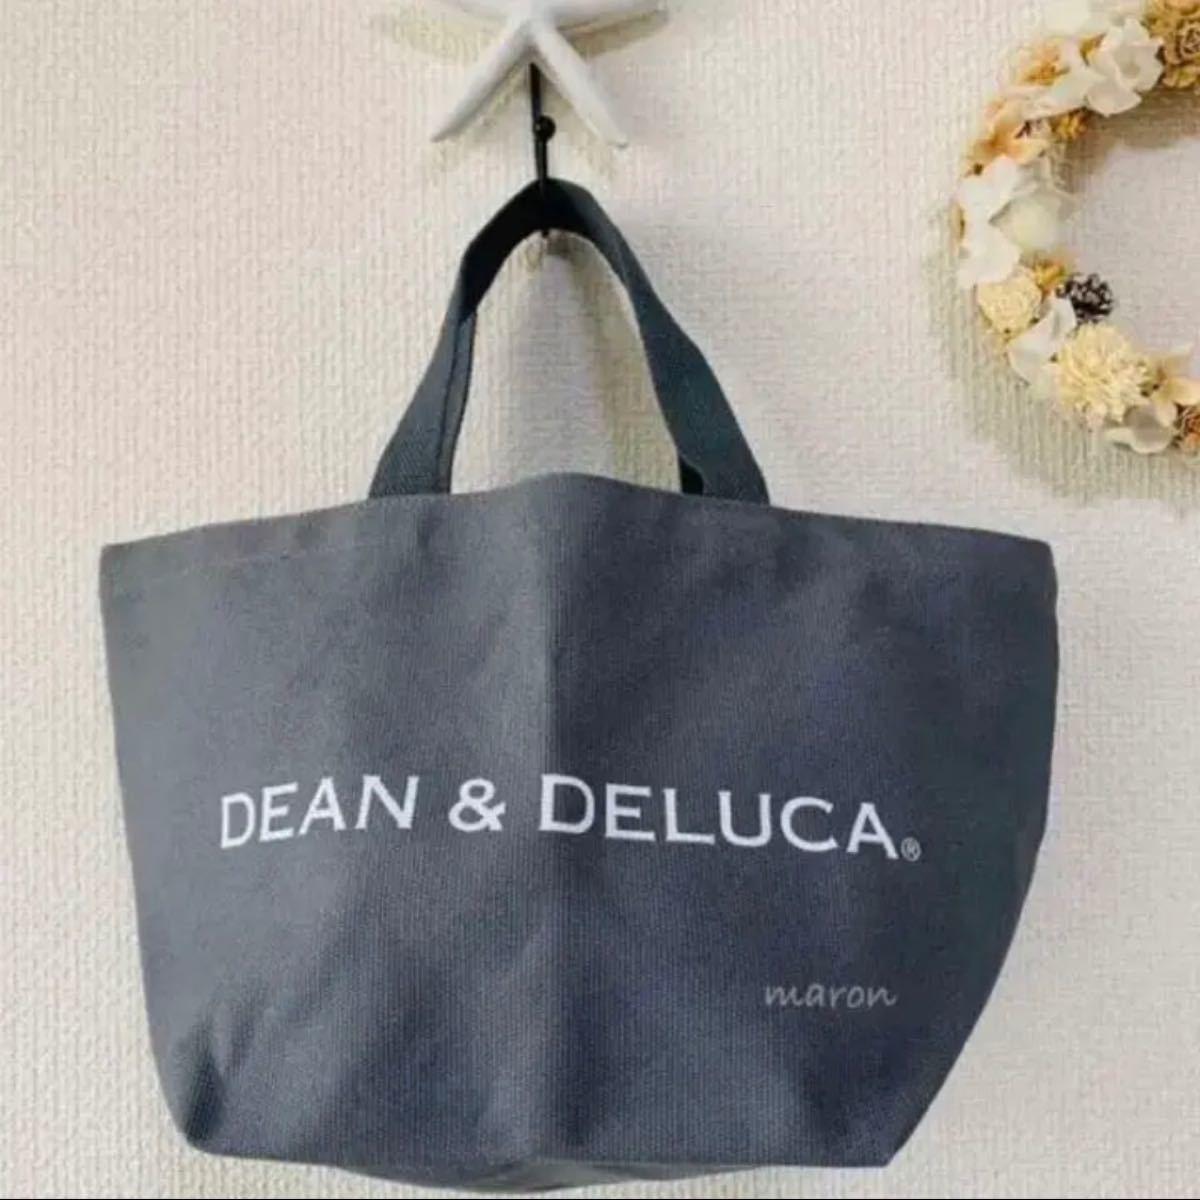 DEAN&DELUCAグレーSサイズ トートバッグエコバッグ ショッピングバッグ